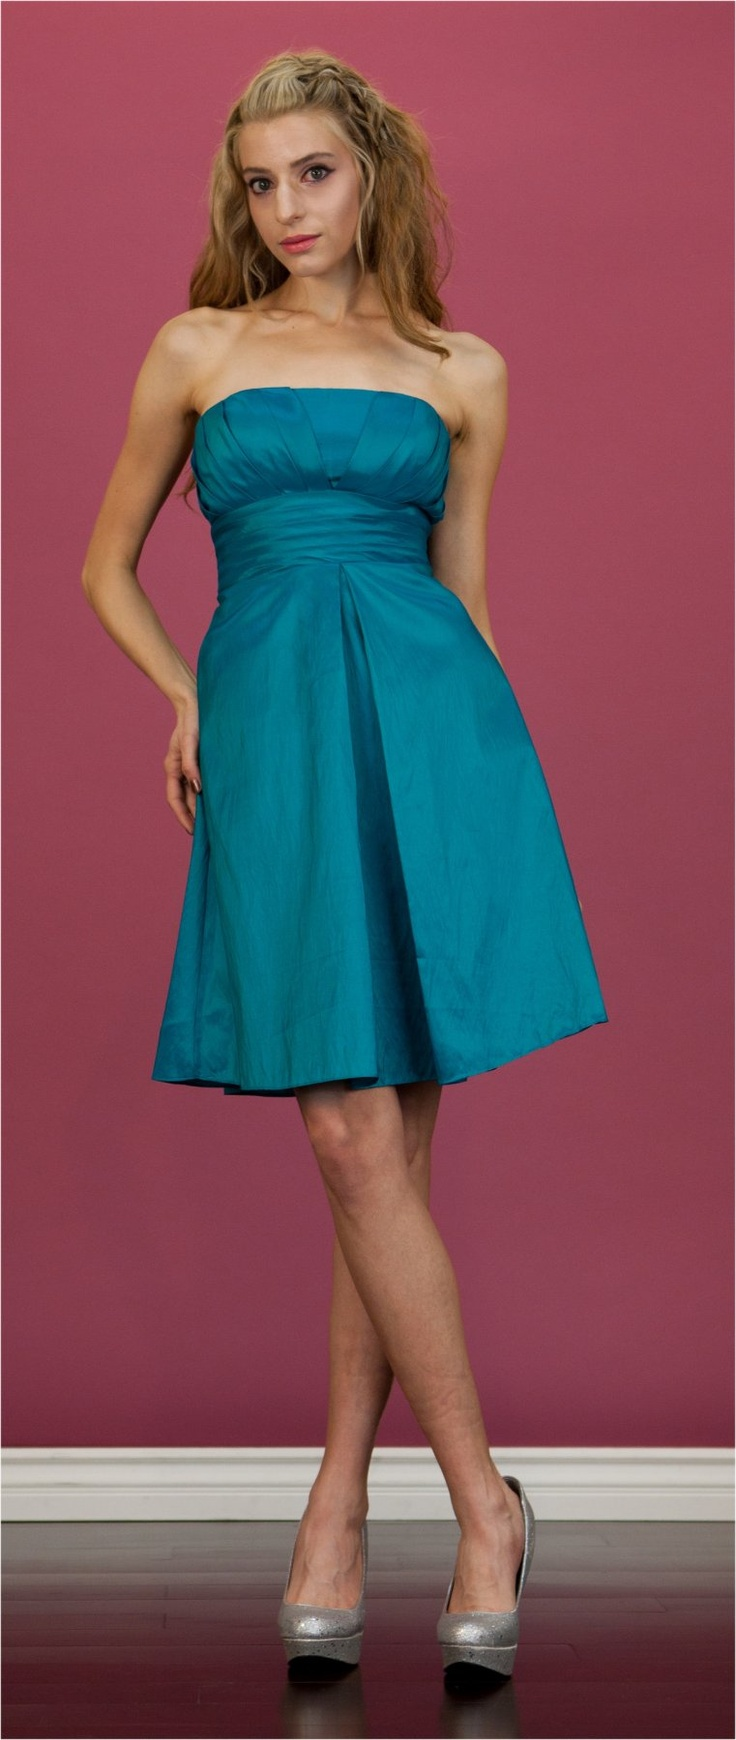 71 best Hot Pink Dresses images on Pinterest   Bright pink dresses ...